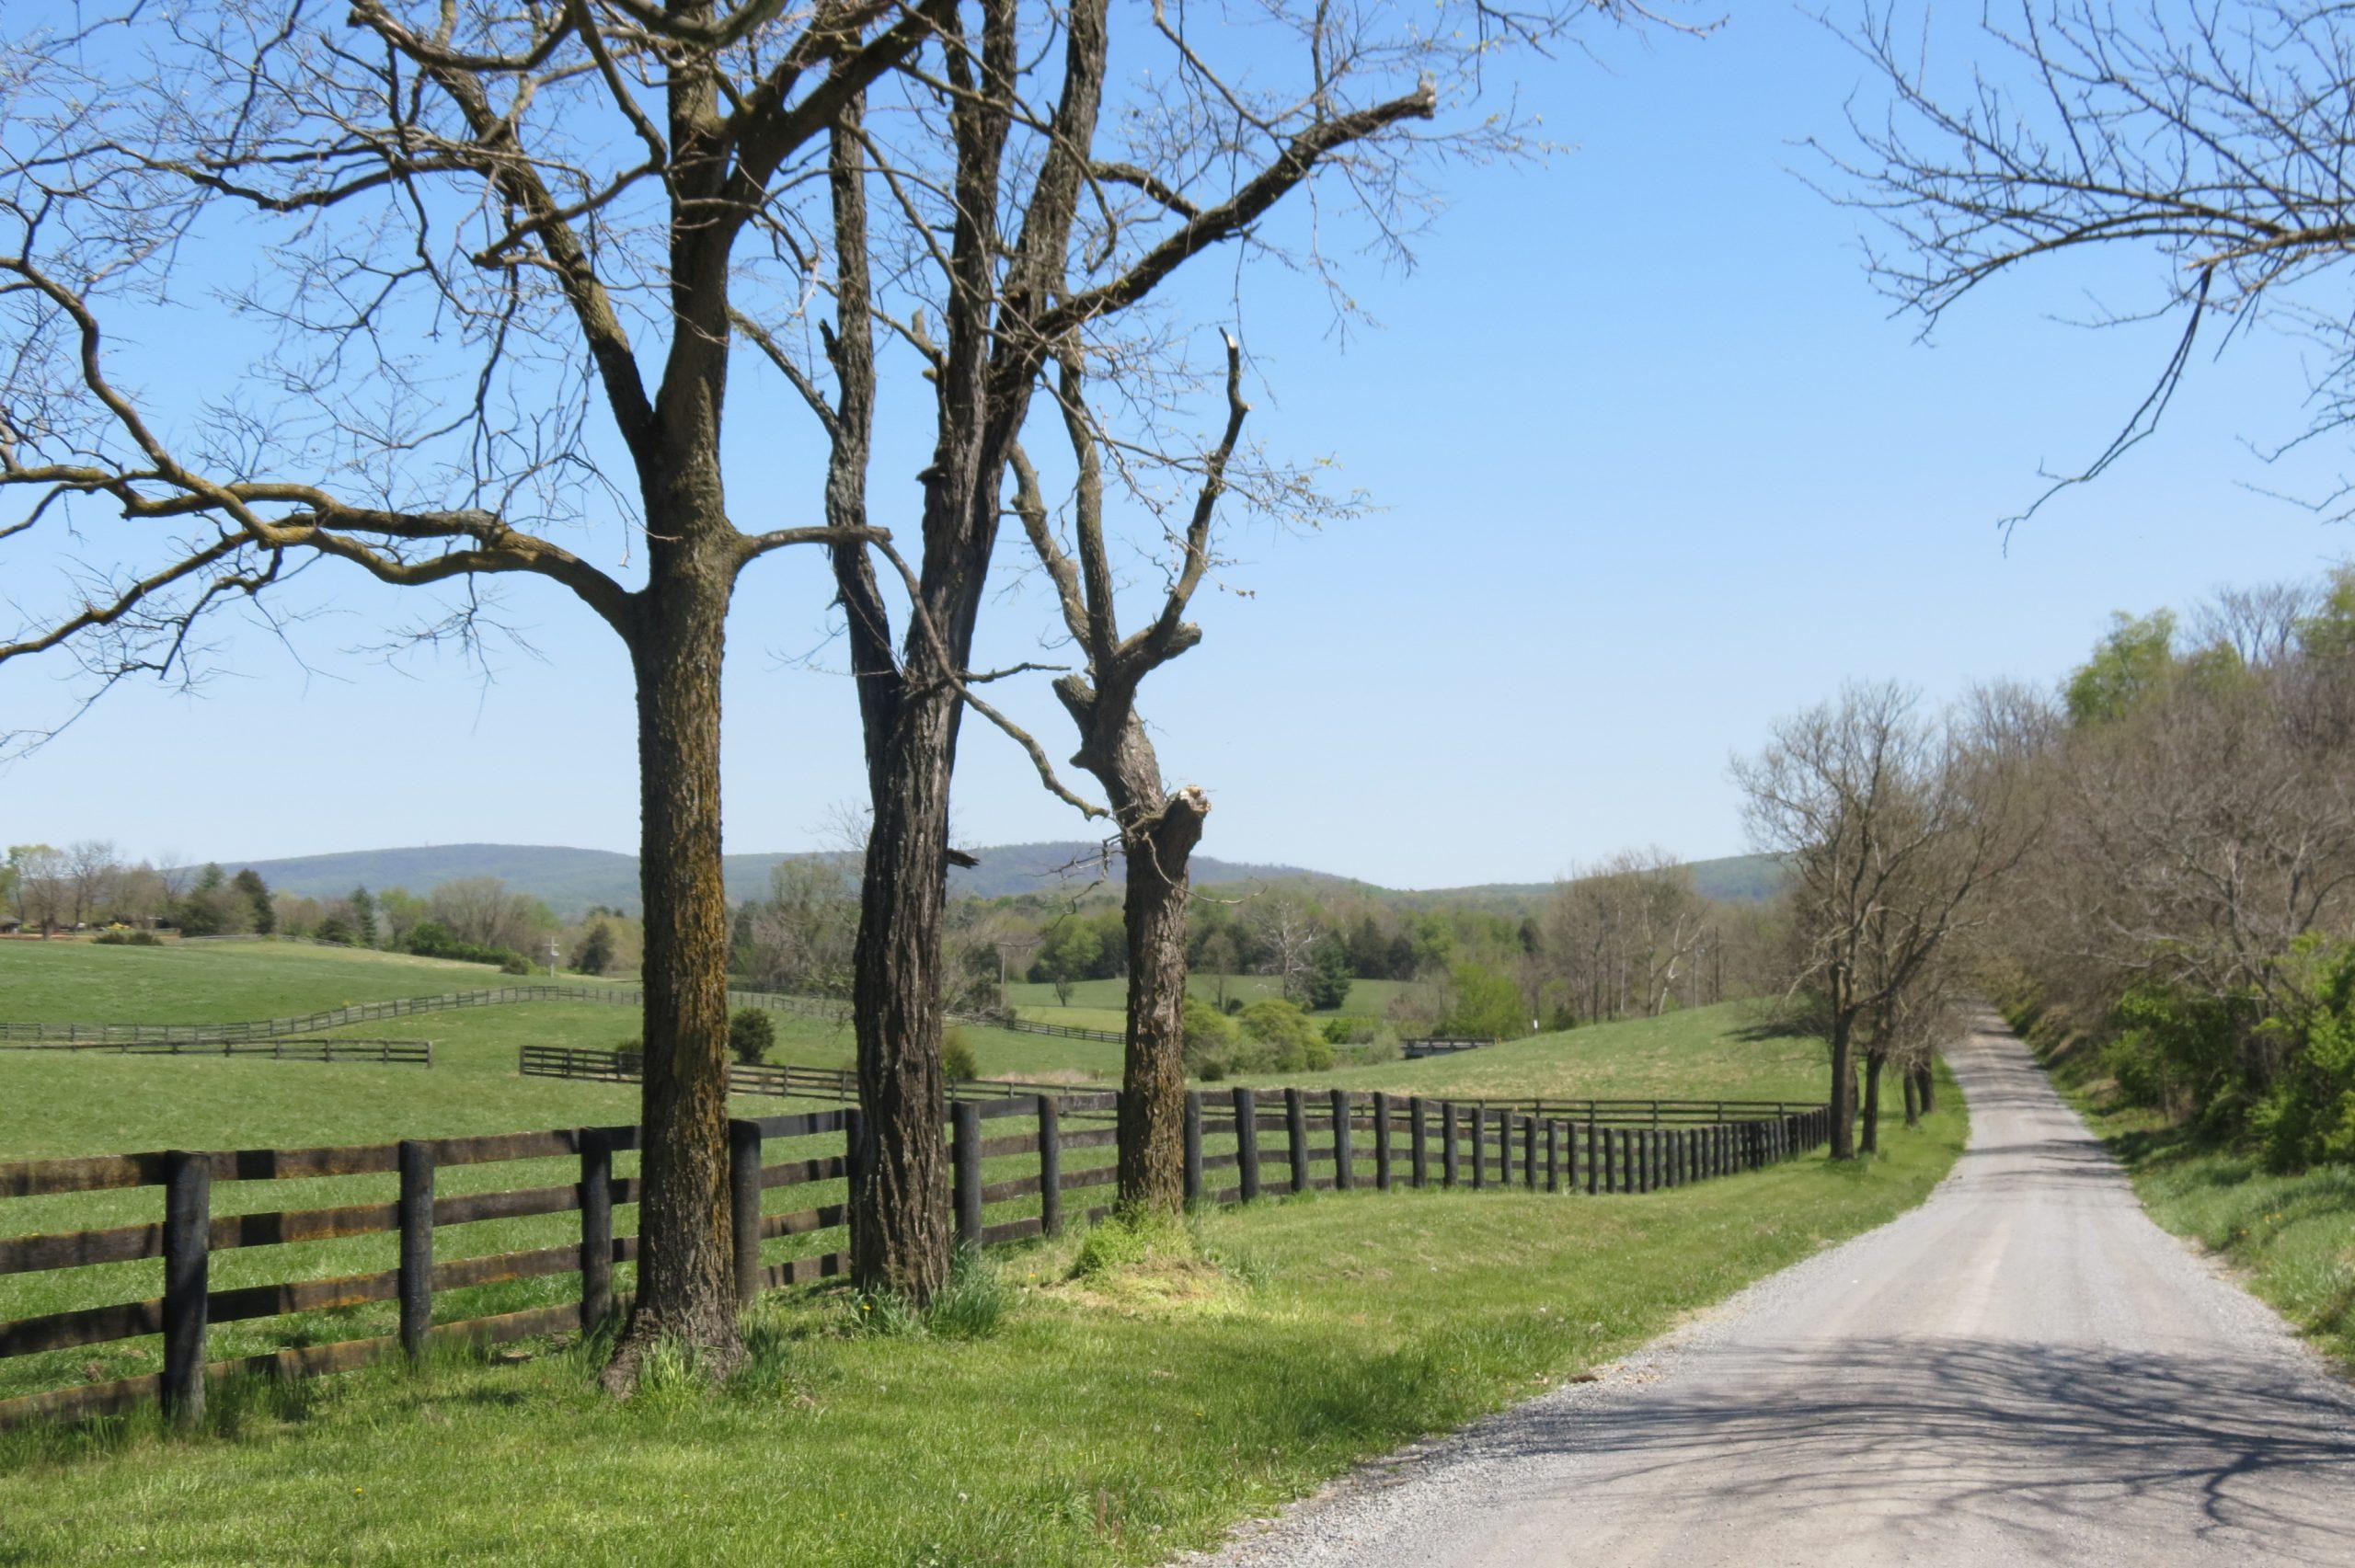 Greenway Rural Historic District